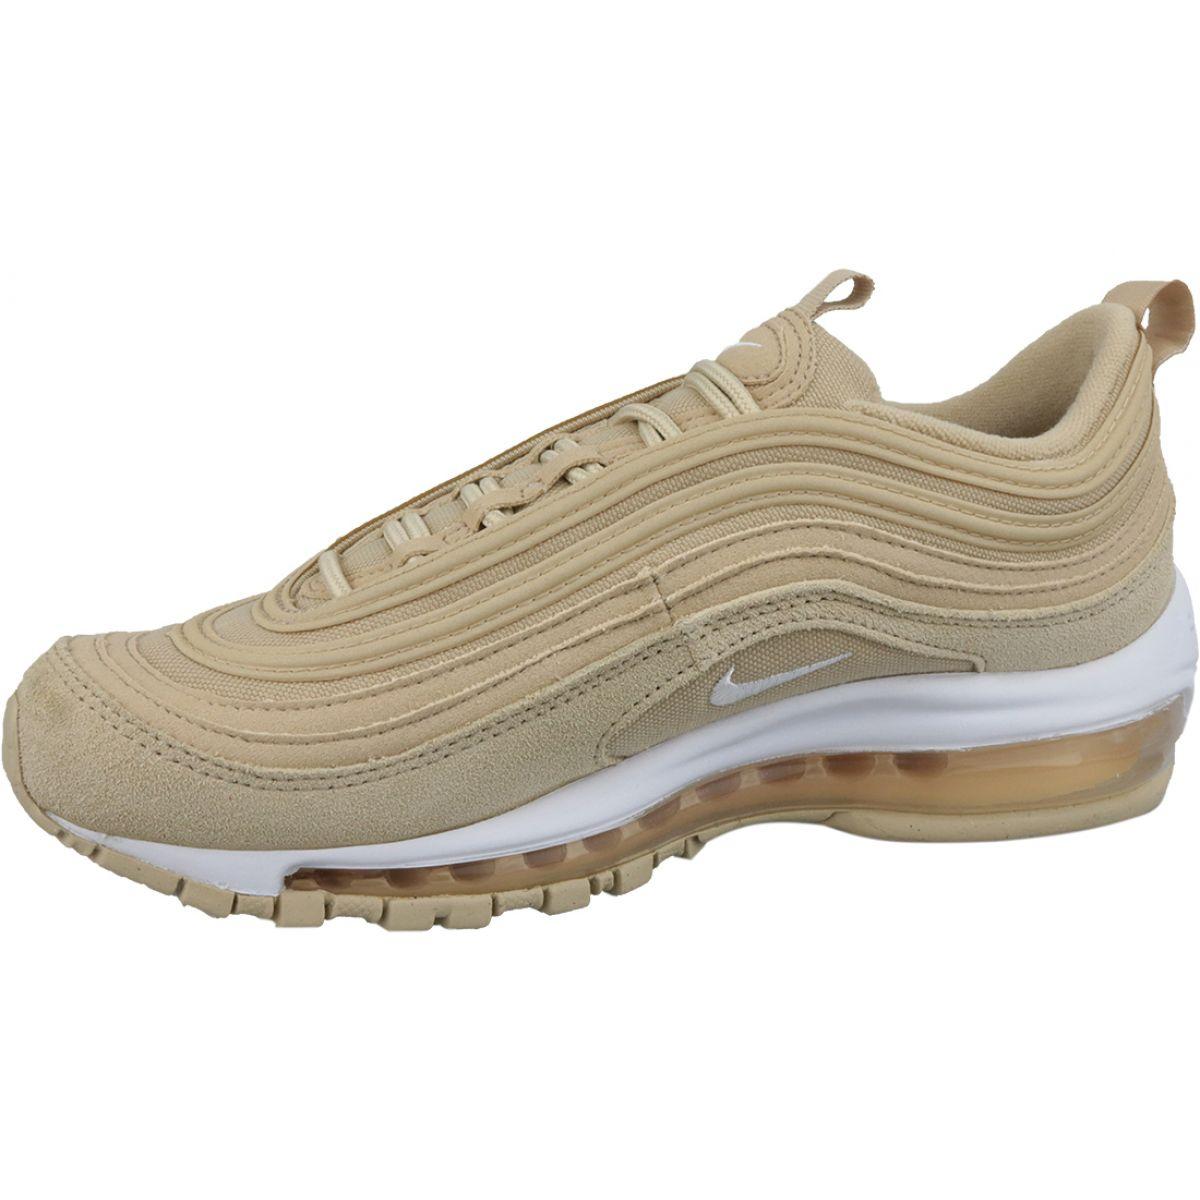 Nike Air Max 97 UL 17 W Schuhe braun beige